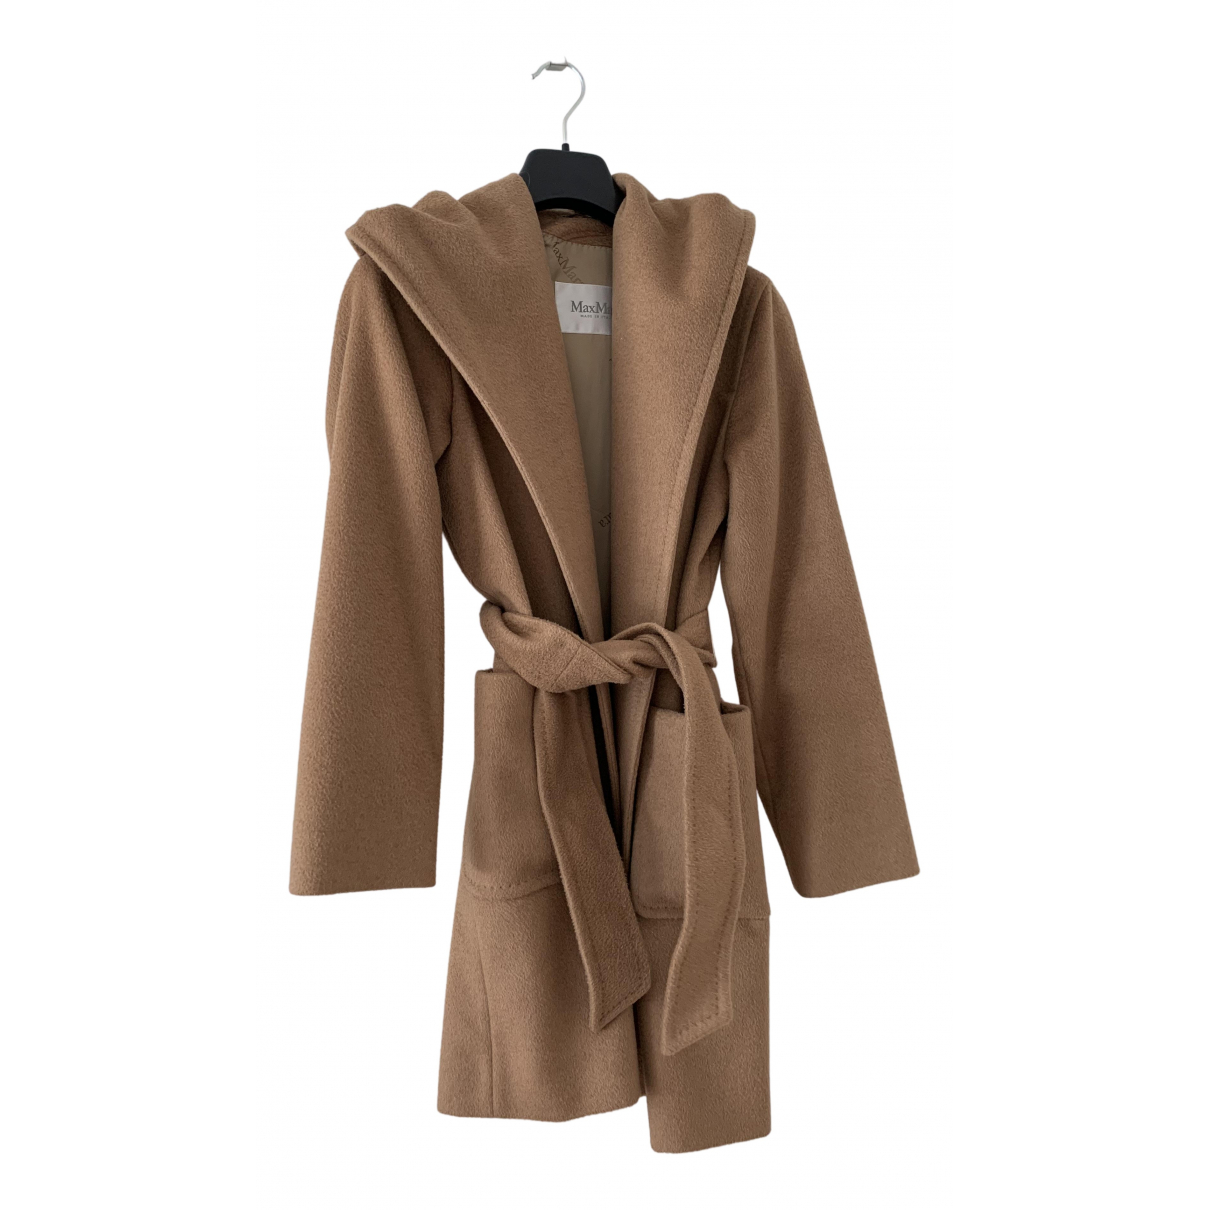 Max Mara N Beige Wool coat for Women 36 FR